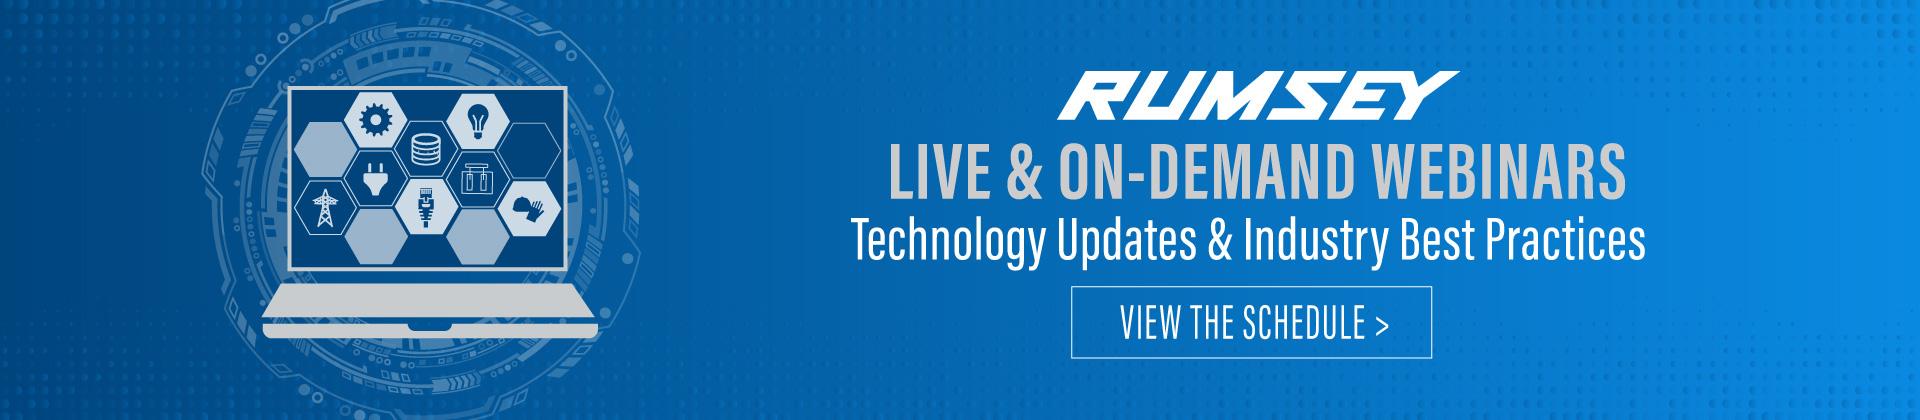 Rumsey Live & On-Demand Webinars